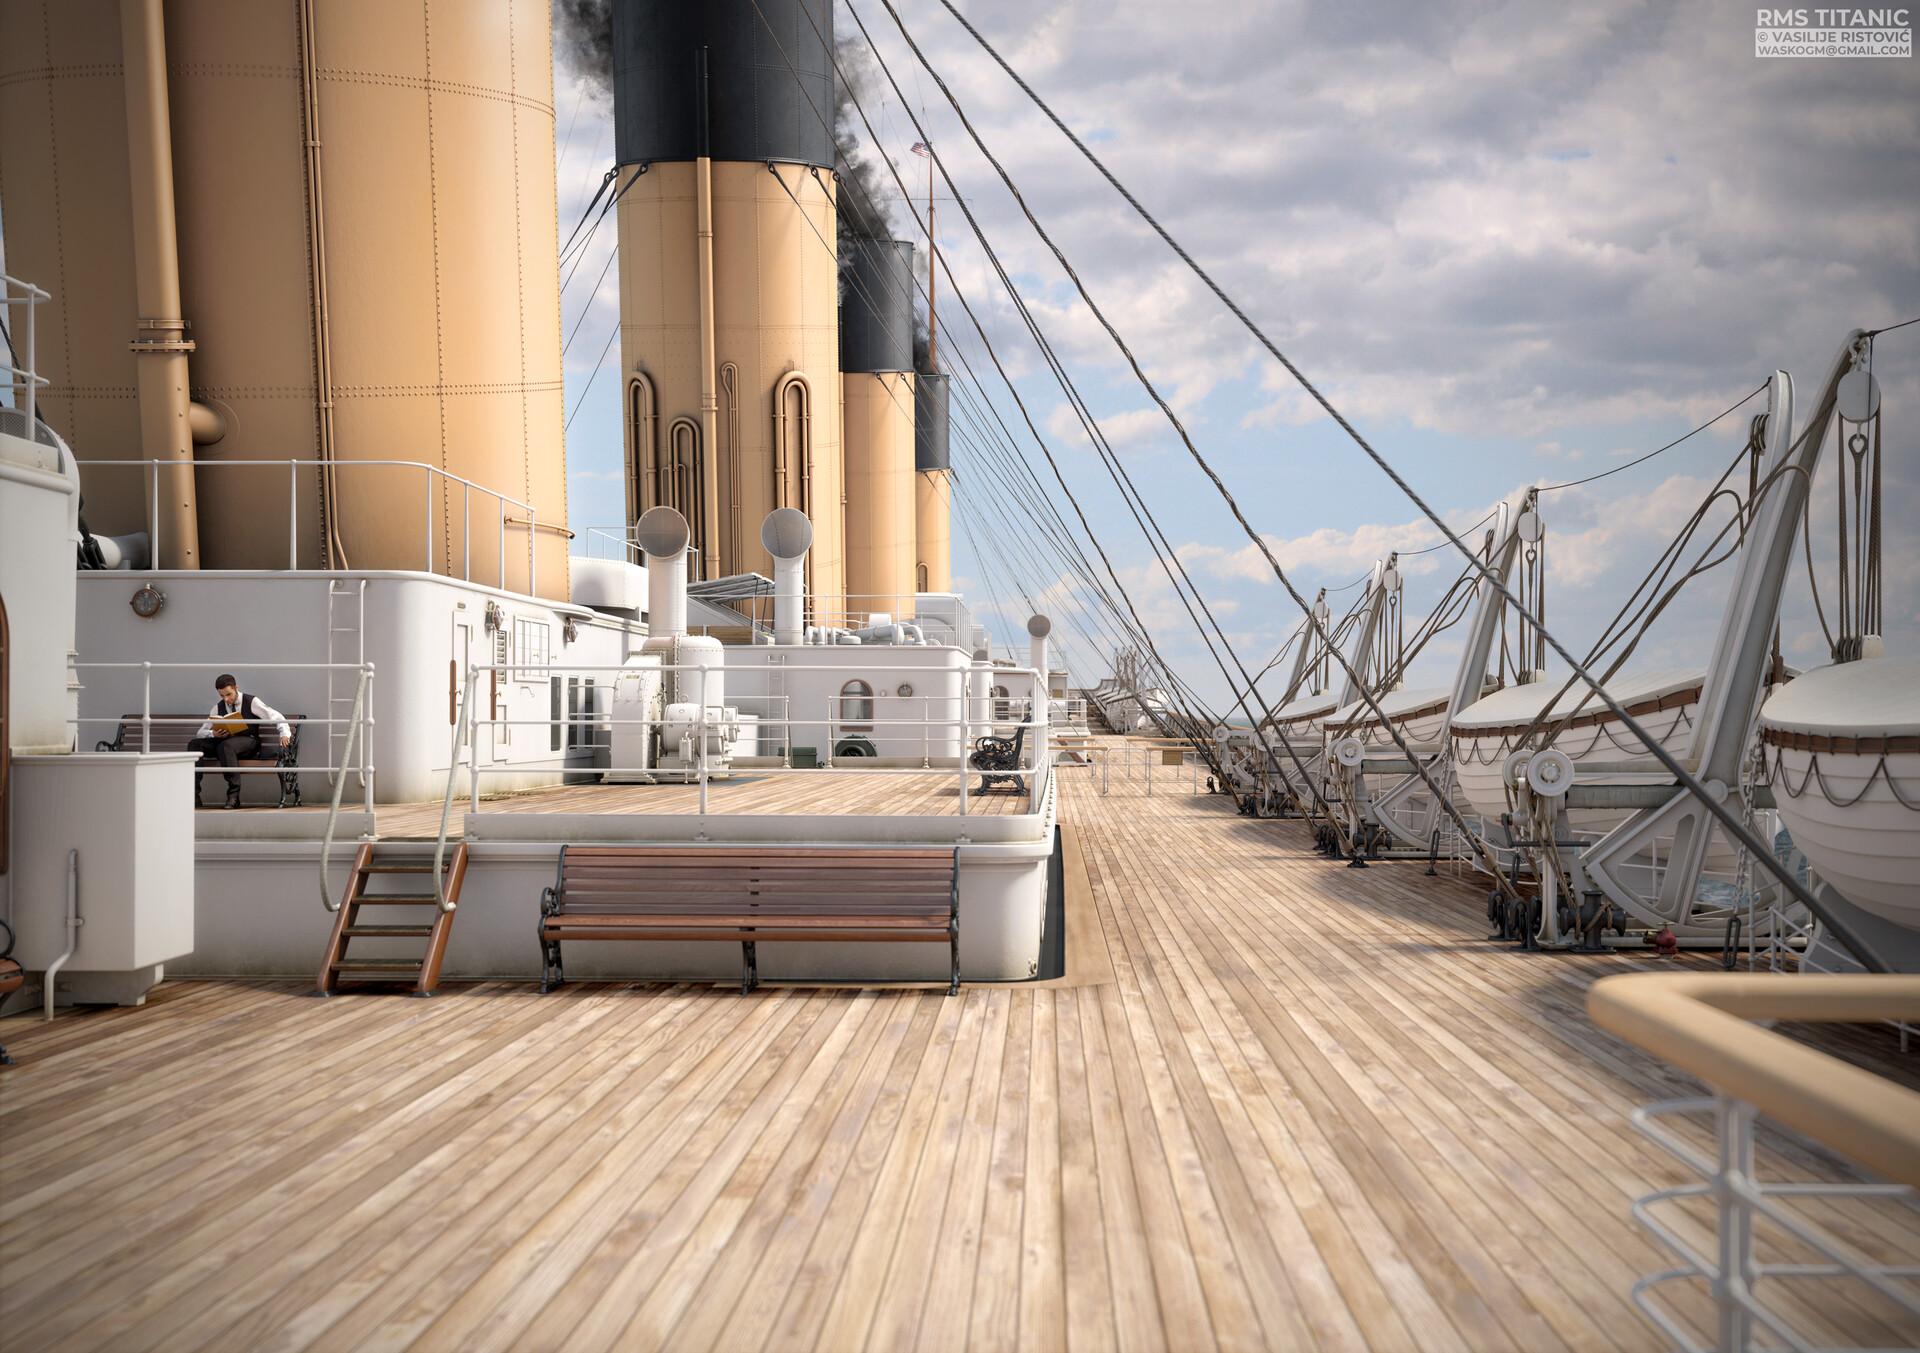 Montage Titanic Trumpeter 1/200 - Page 10 Vasilije-ristovic-rms-titanic-web